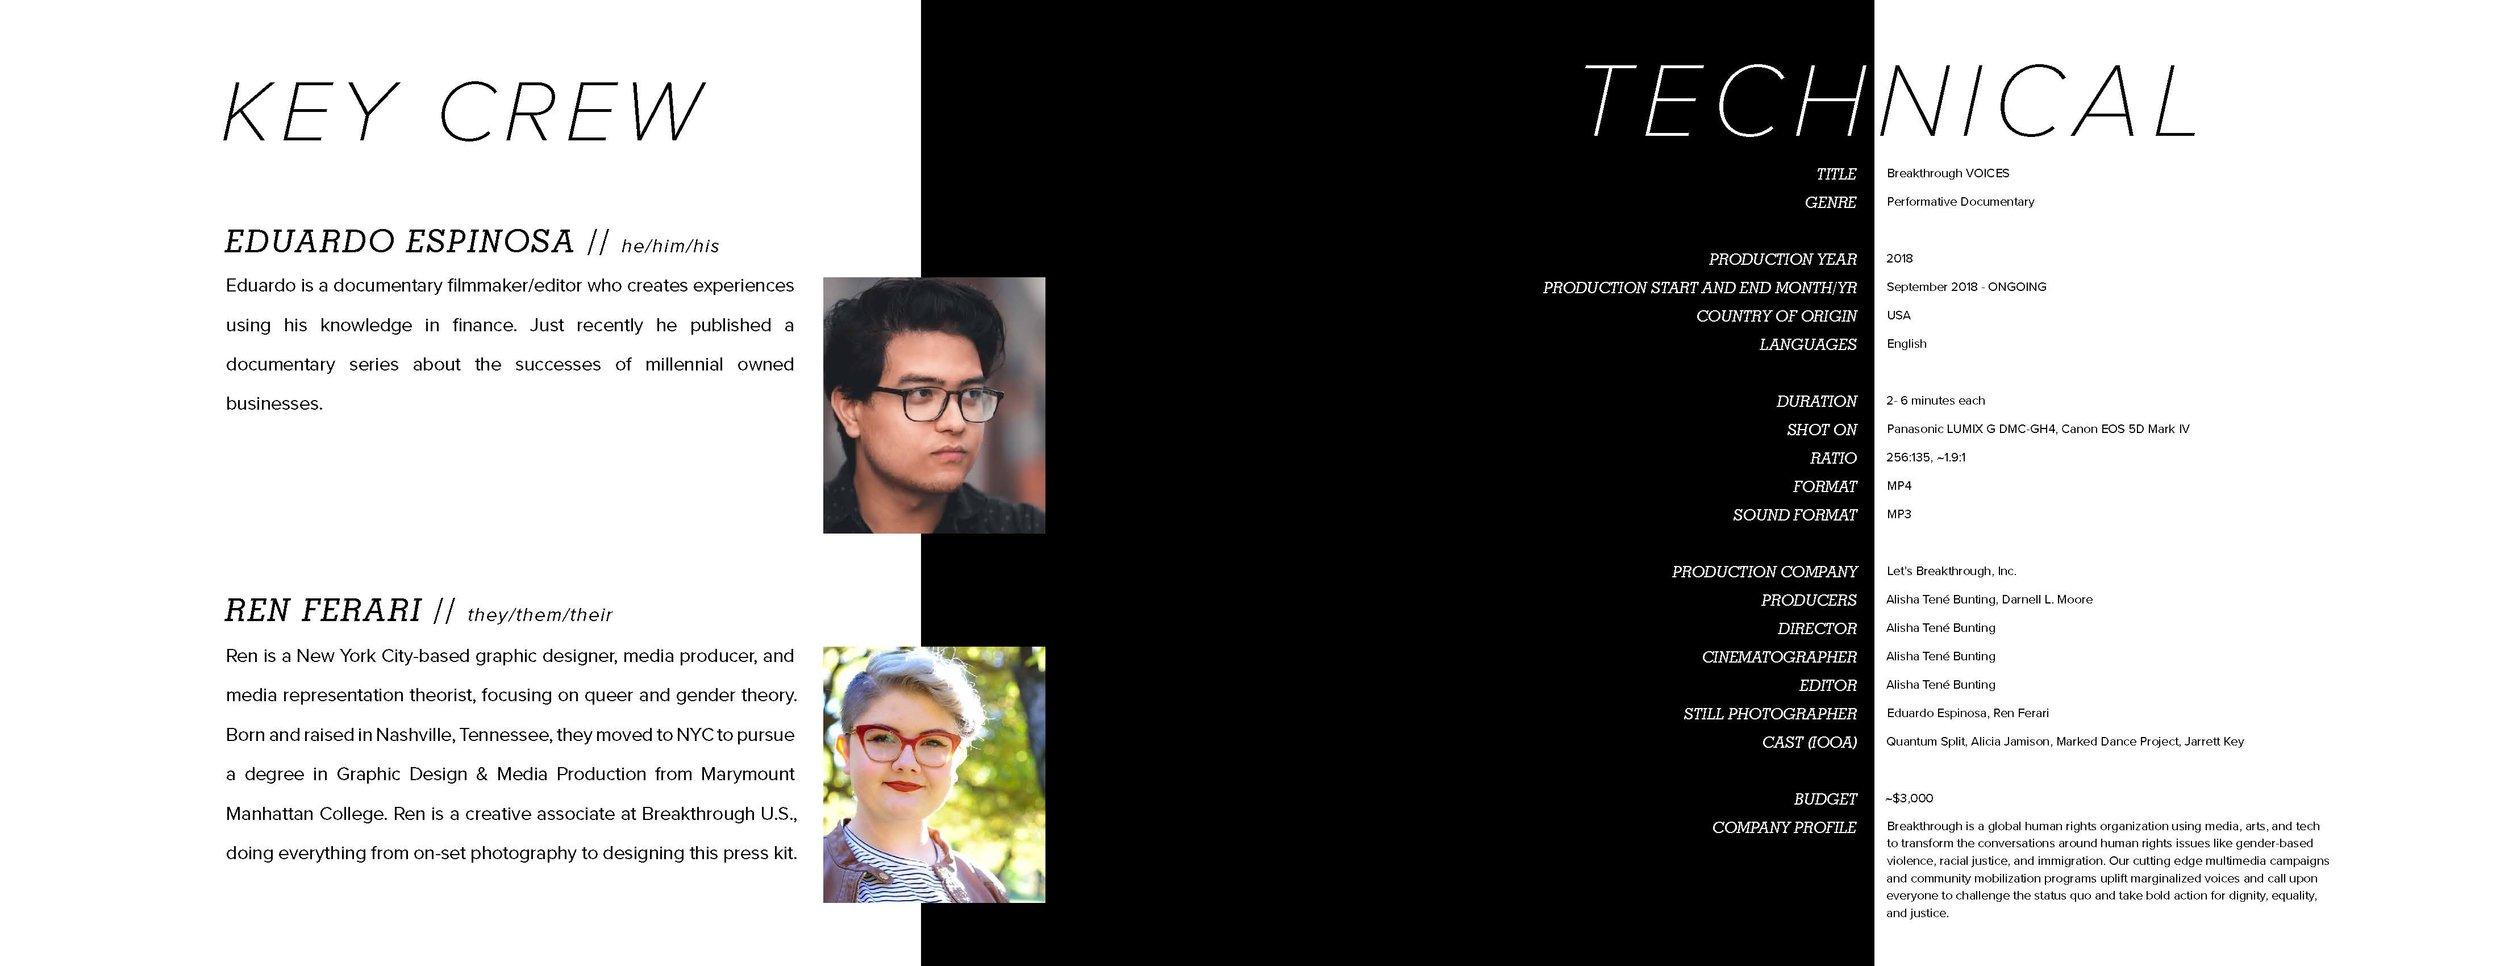 BTV 2019 Press Kit S2 V2_Page_11.jpg